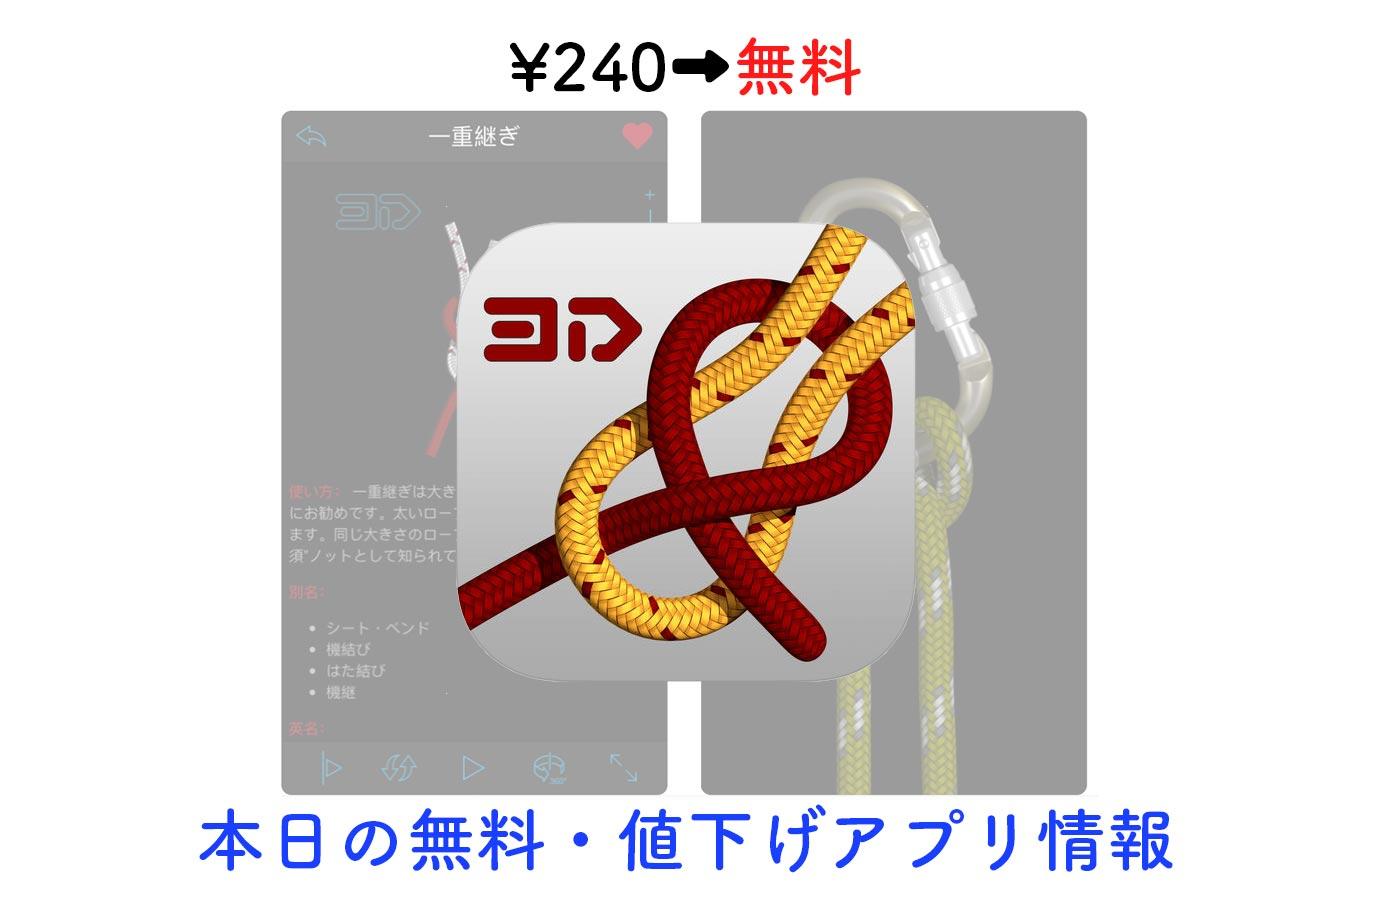 Appsale0507